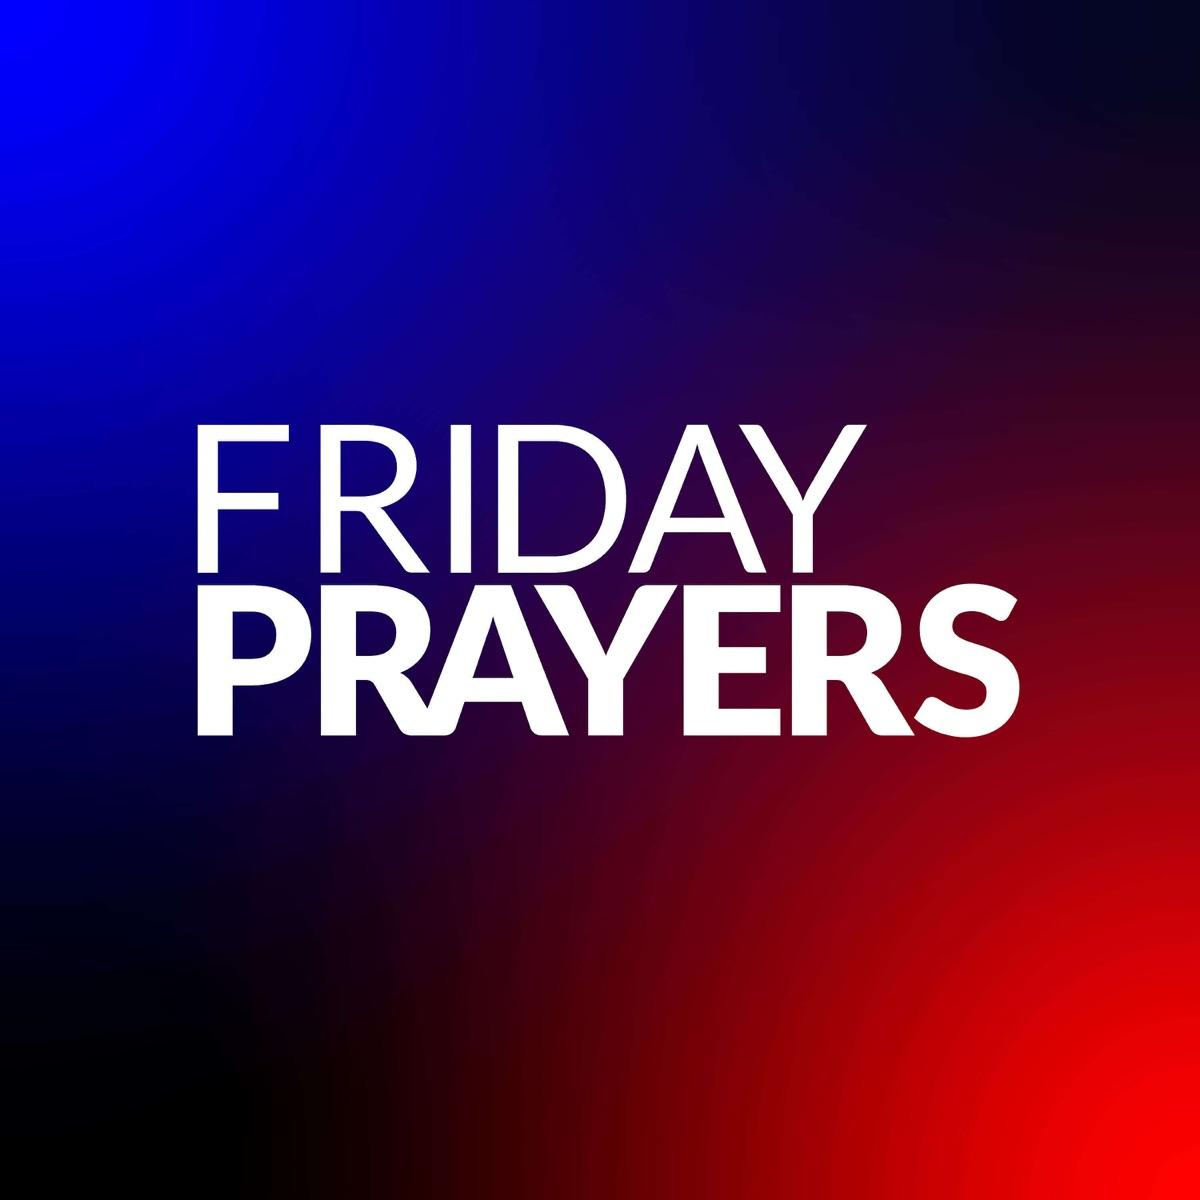 Friday Prayers